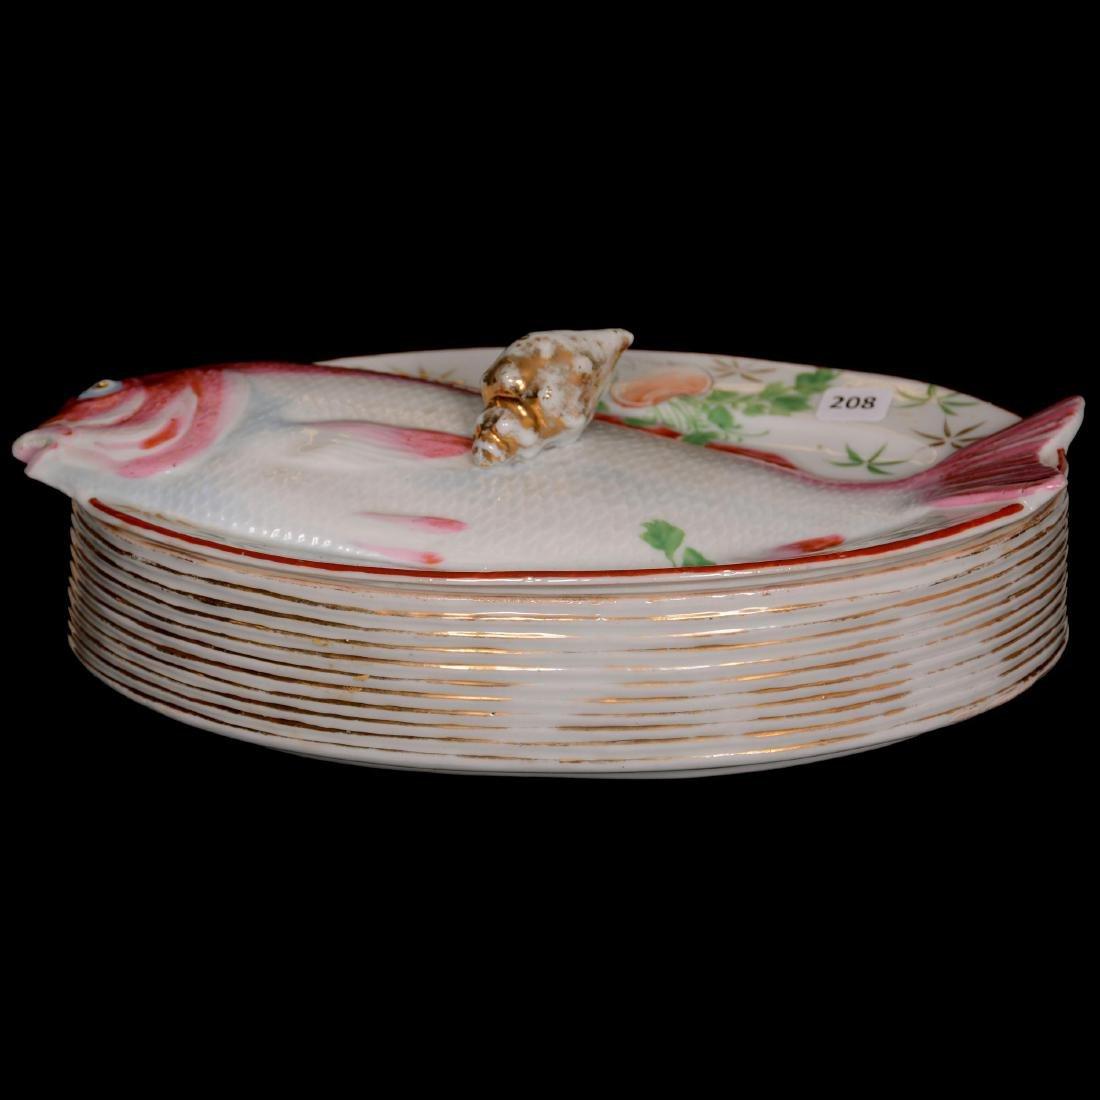 Early Fish Casserole Dish